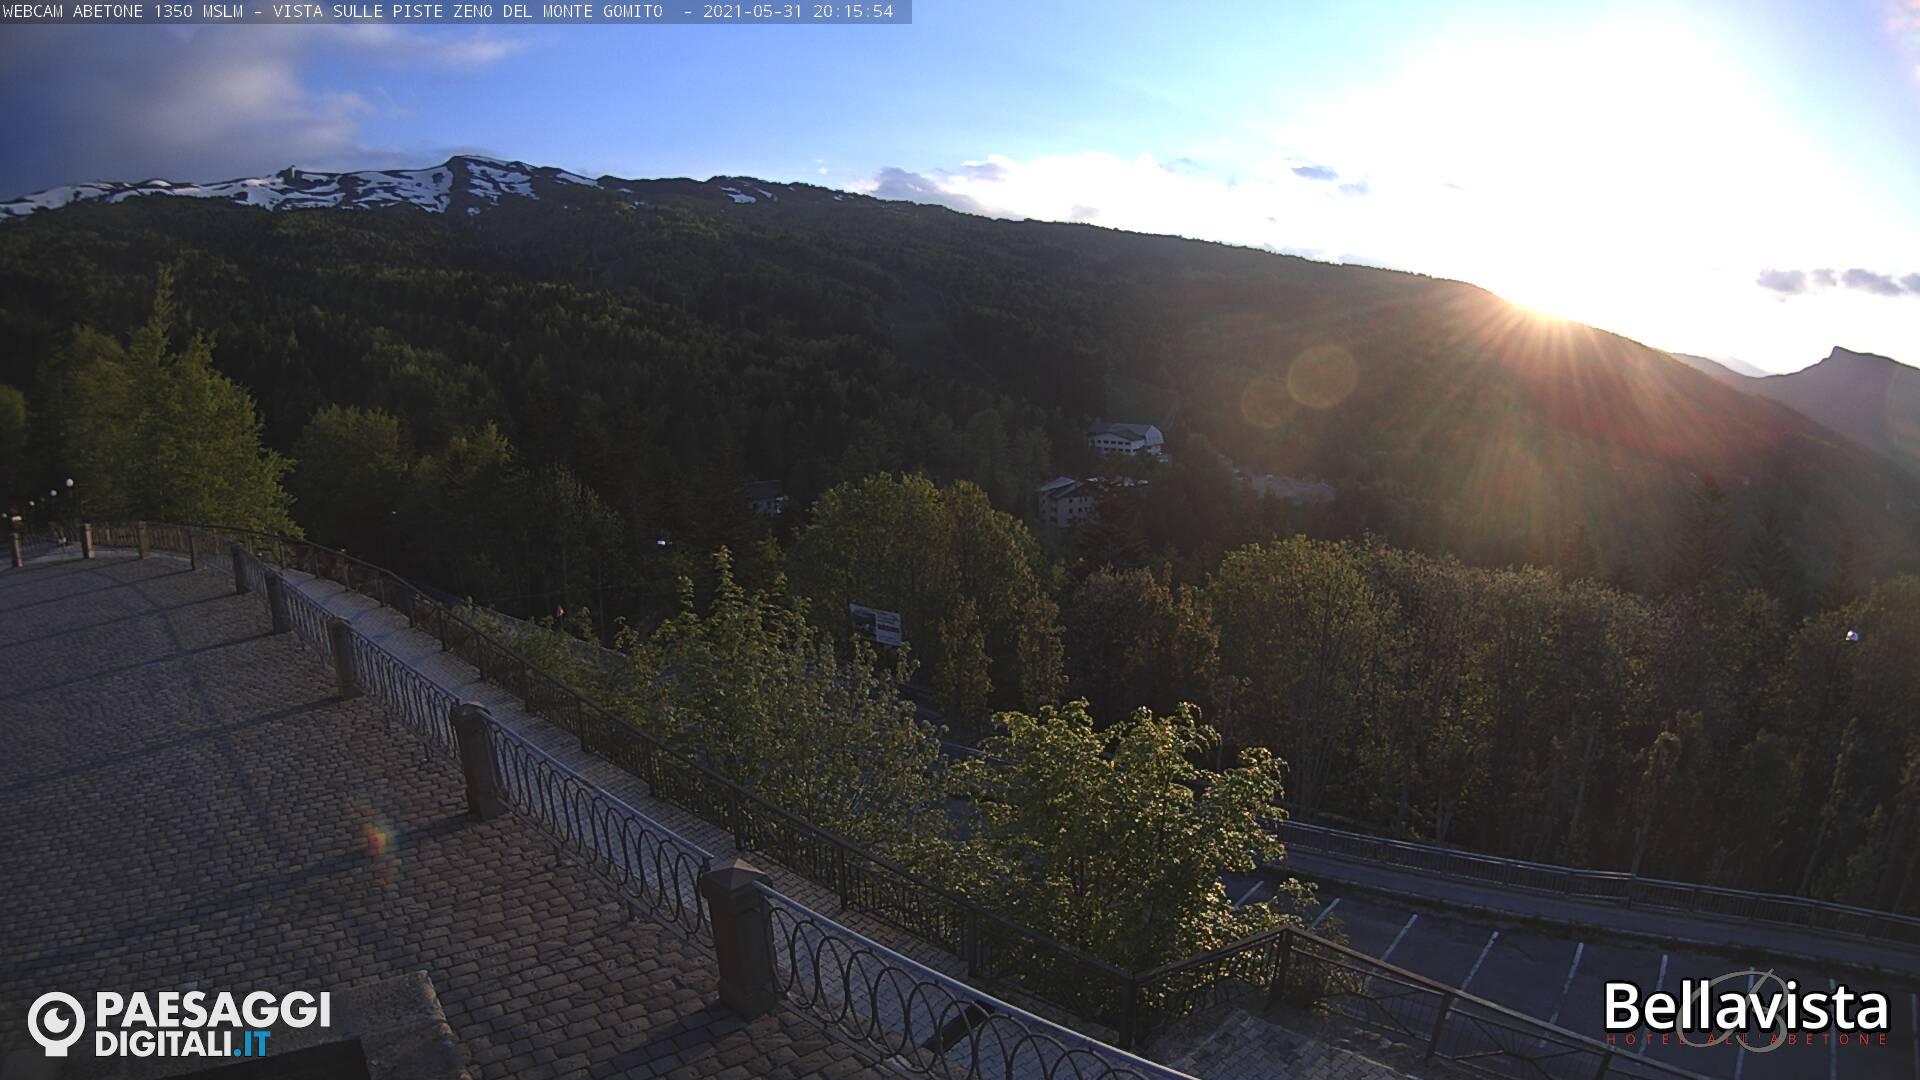 Webcam Abetone Monte Gomito (PT)